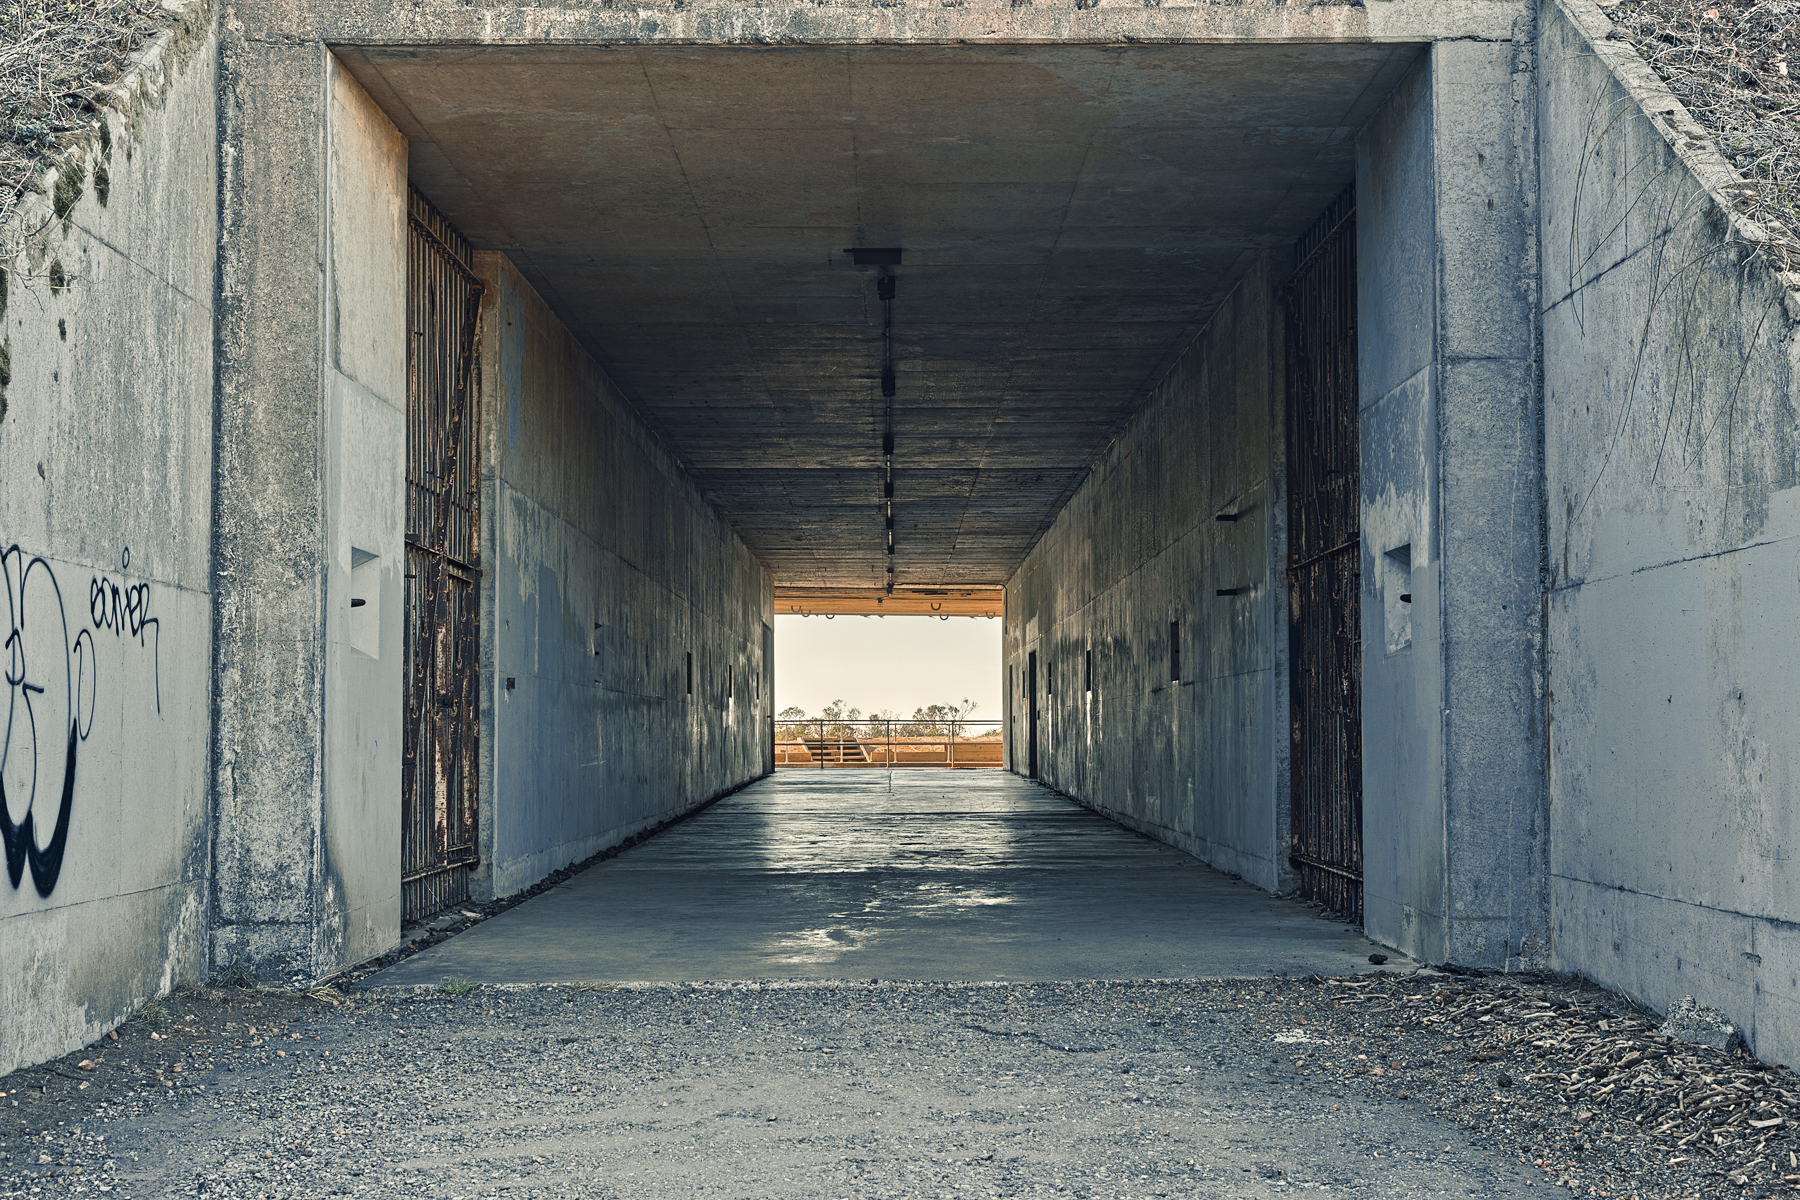 California War Tunnel - HDaRmageddon, , Militaria, Range, Portal, HQ Photo